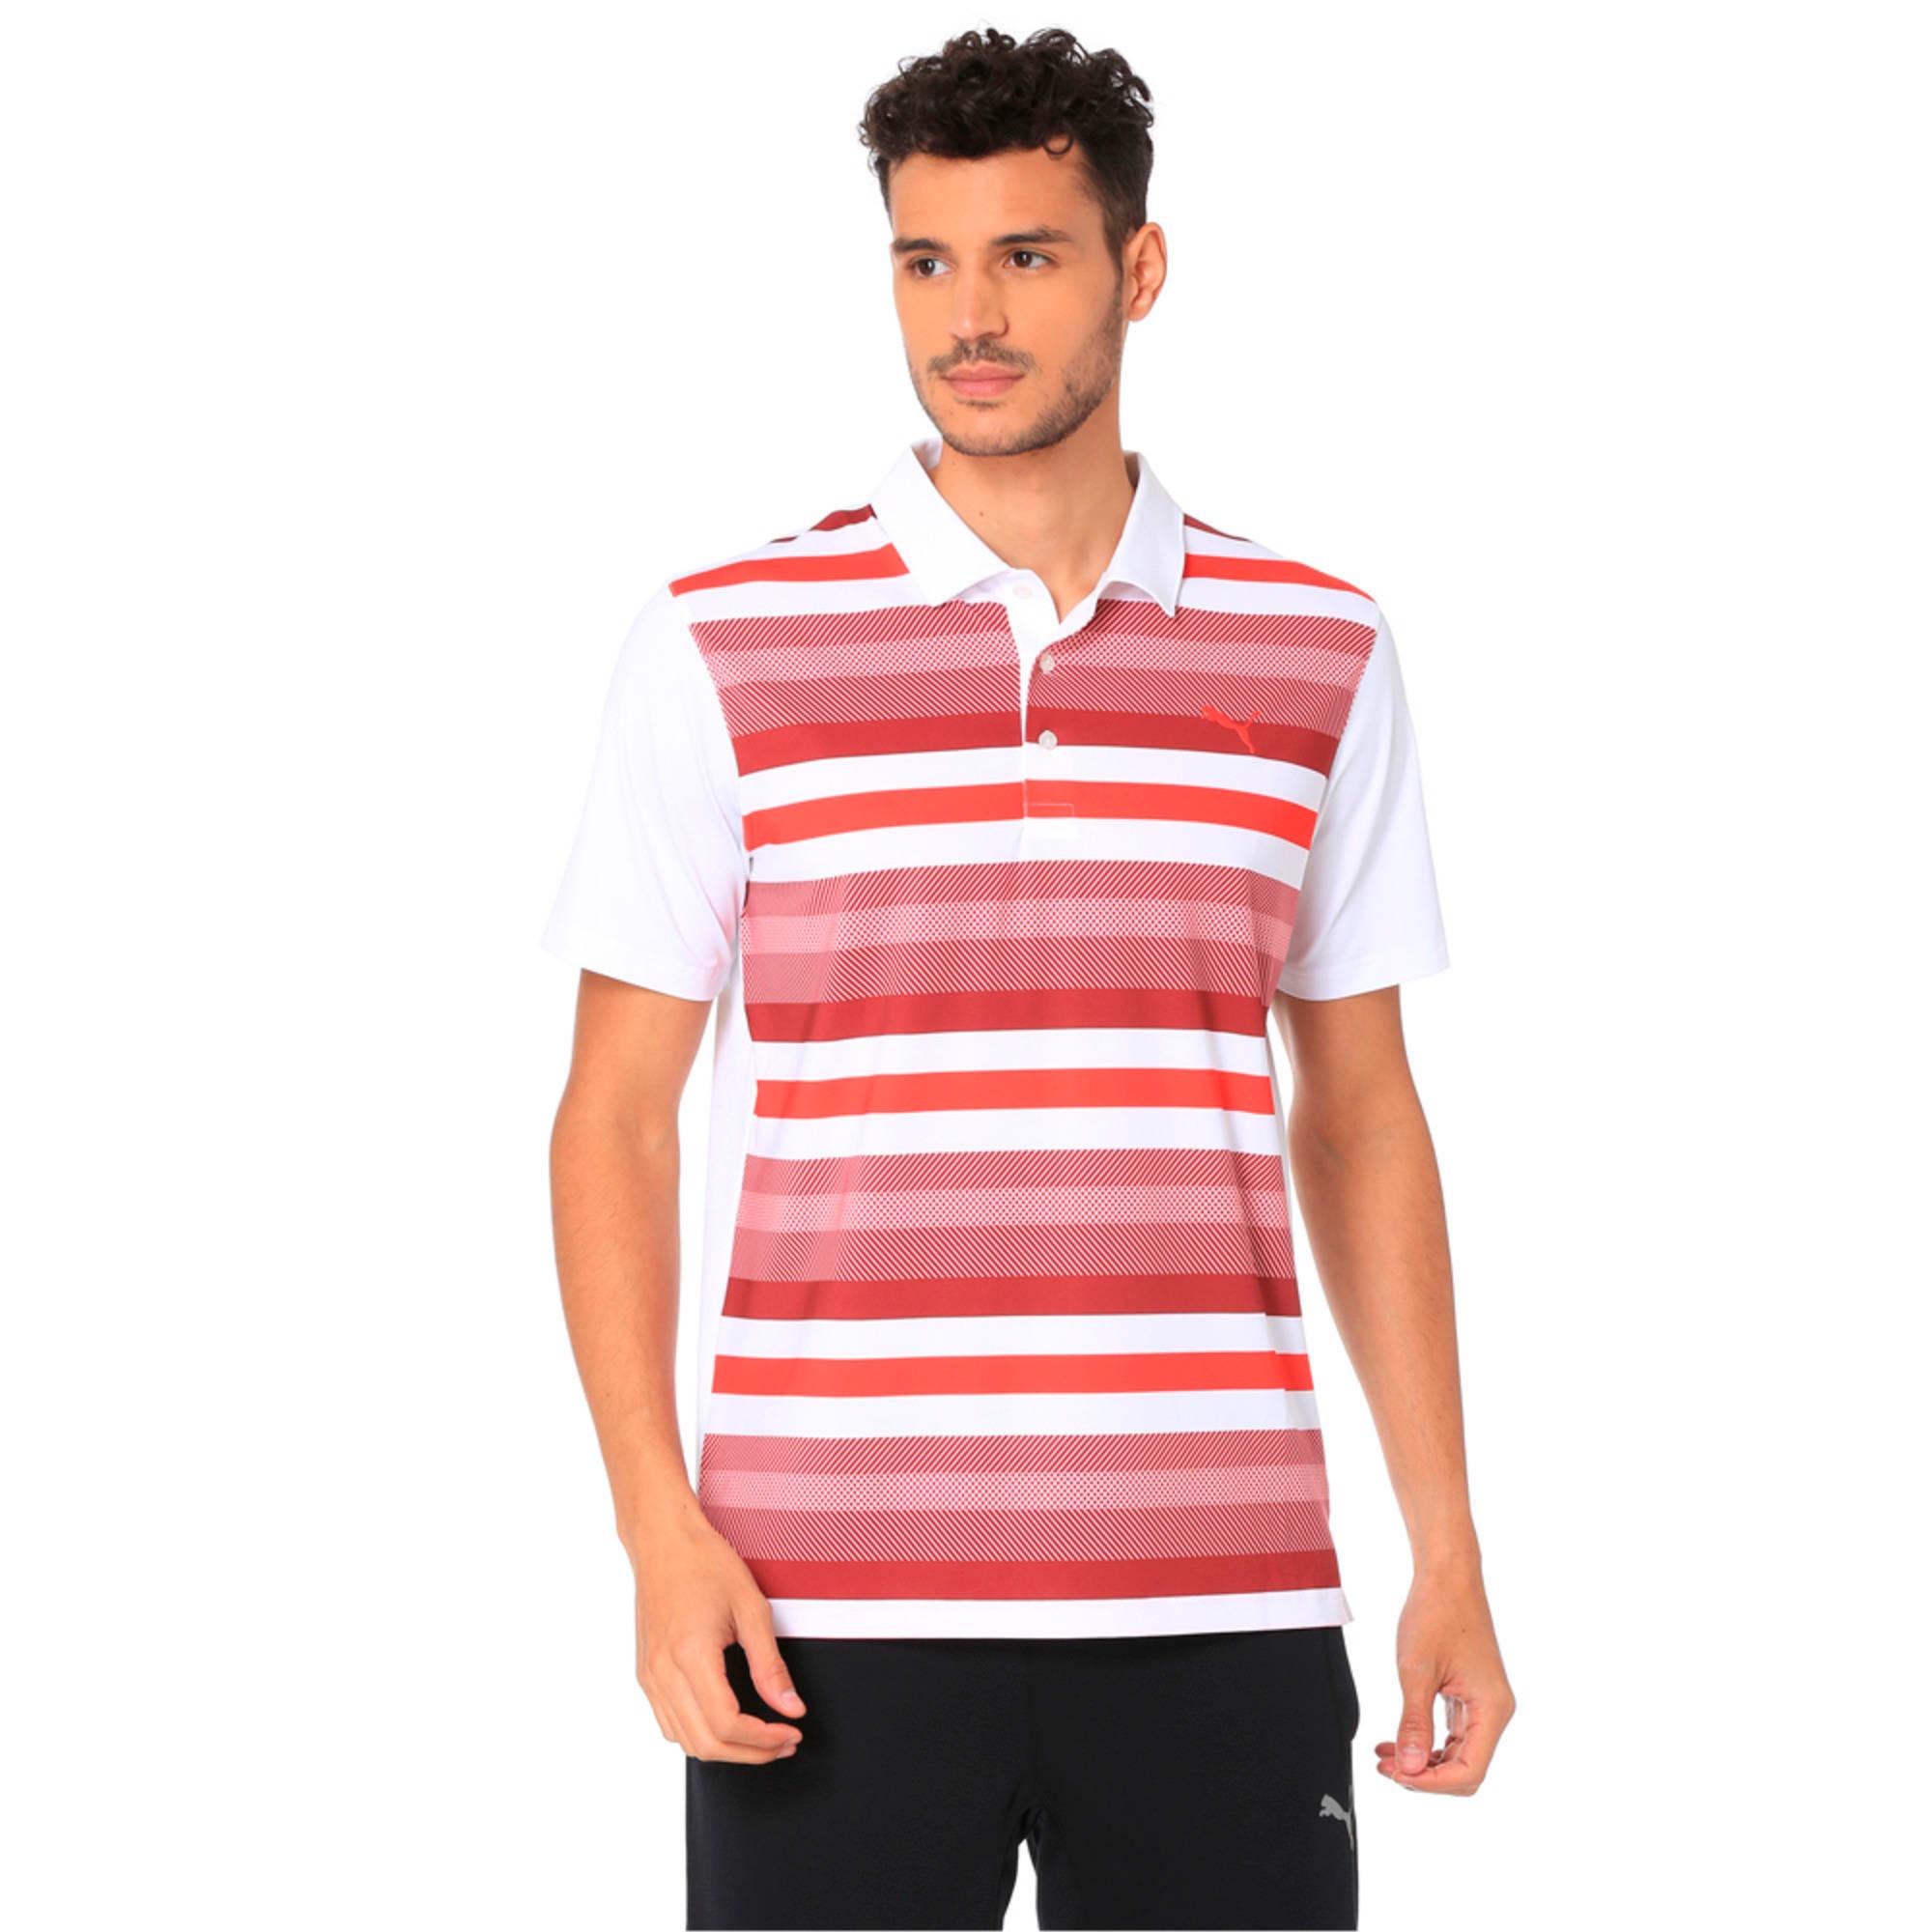 Thumbnail 1 of Golf Men's Turf Stripe Polo, Bright White-Pomegranate, medium-IND